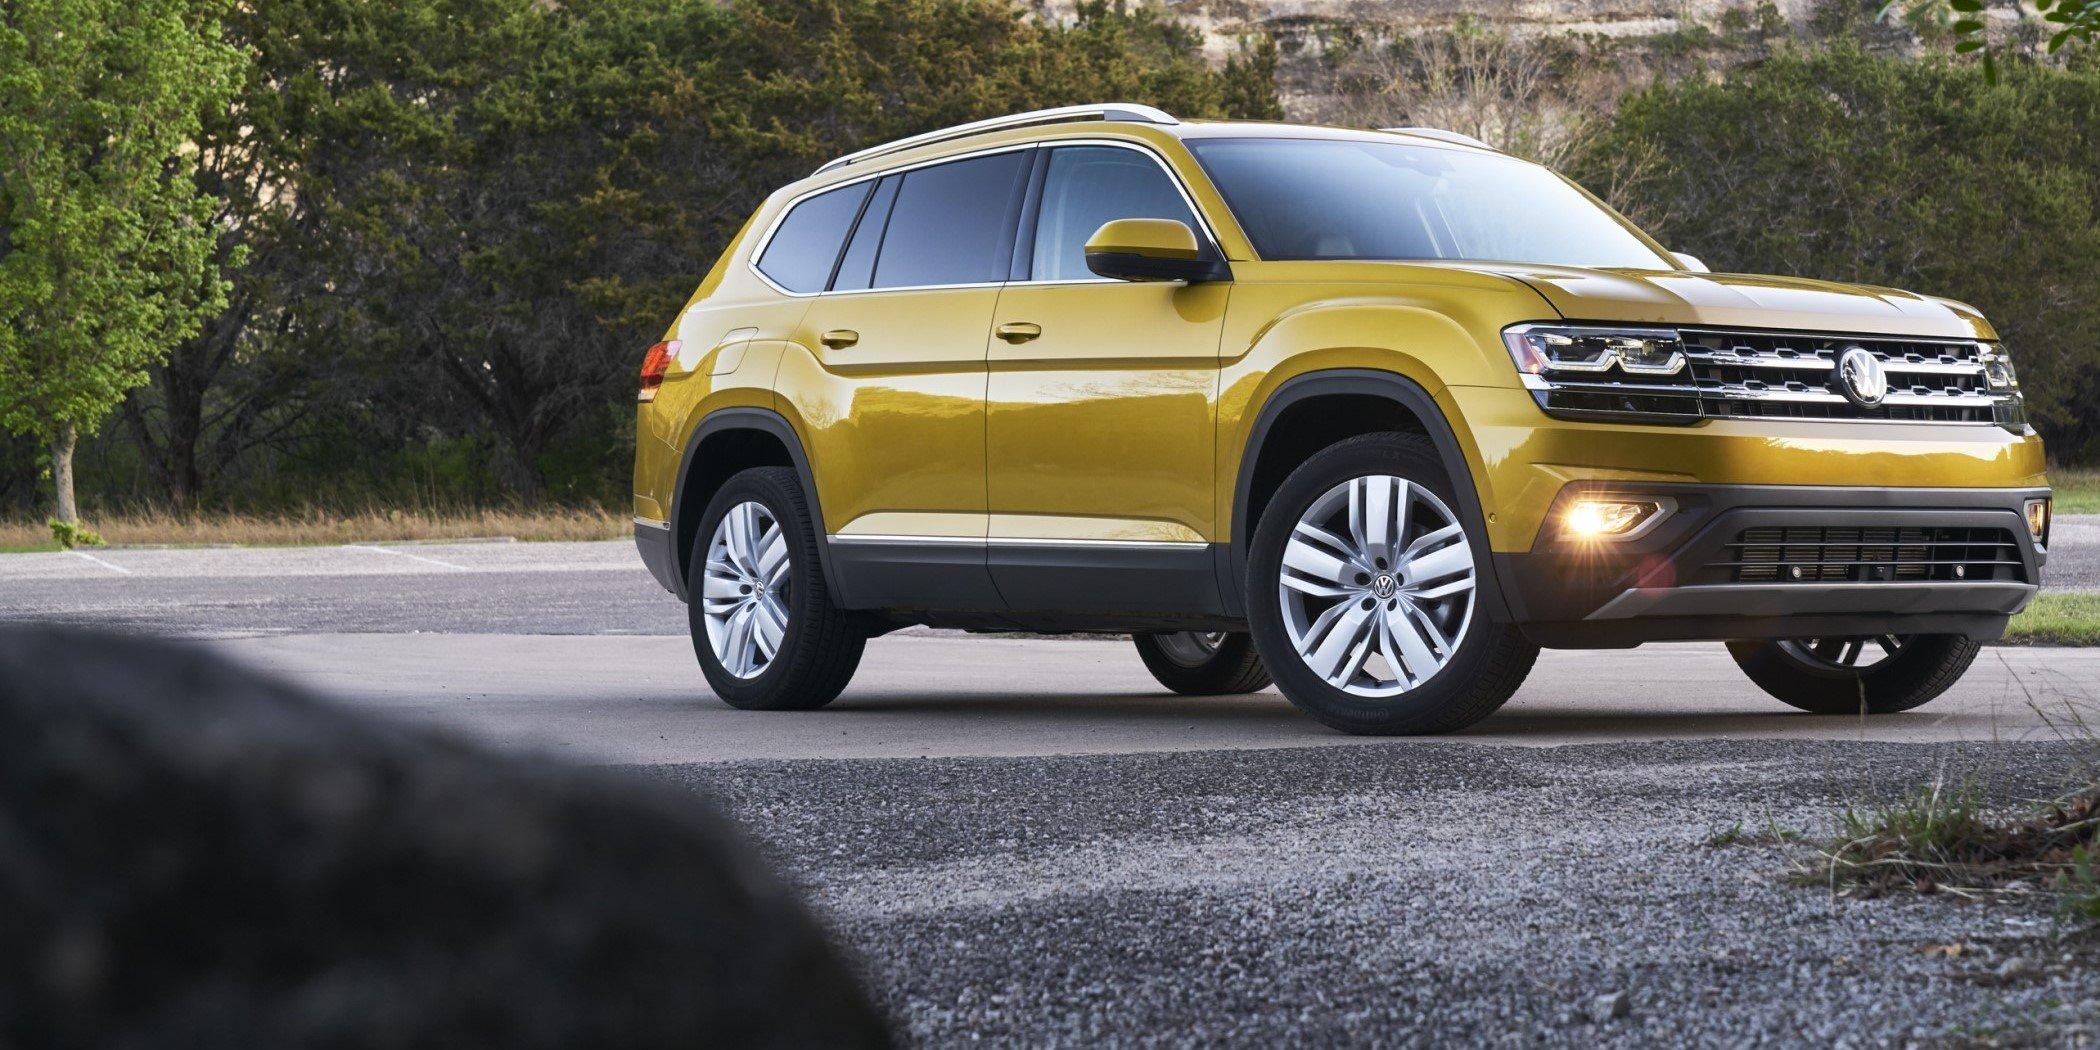 Volkswagen Lease Deals >> Vw Atlas Buy Price Lease Deals For Sale Sioux Falls Sd